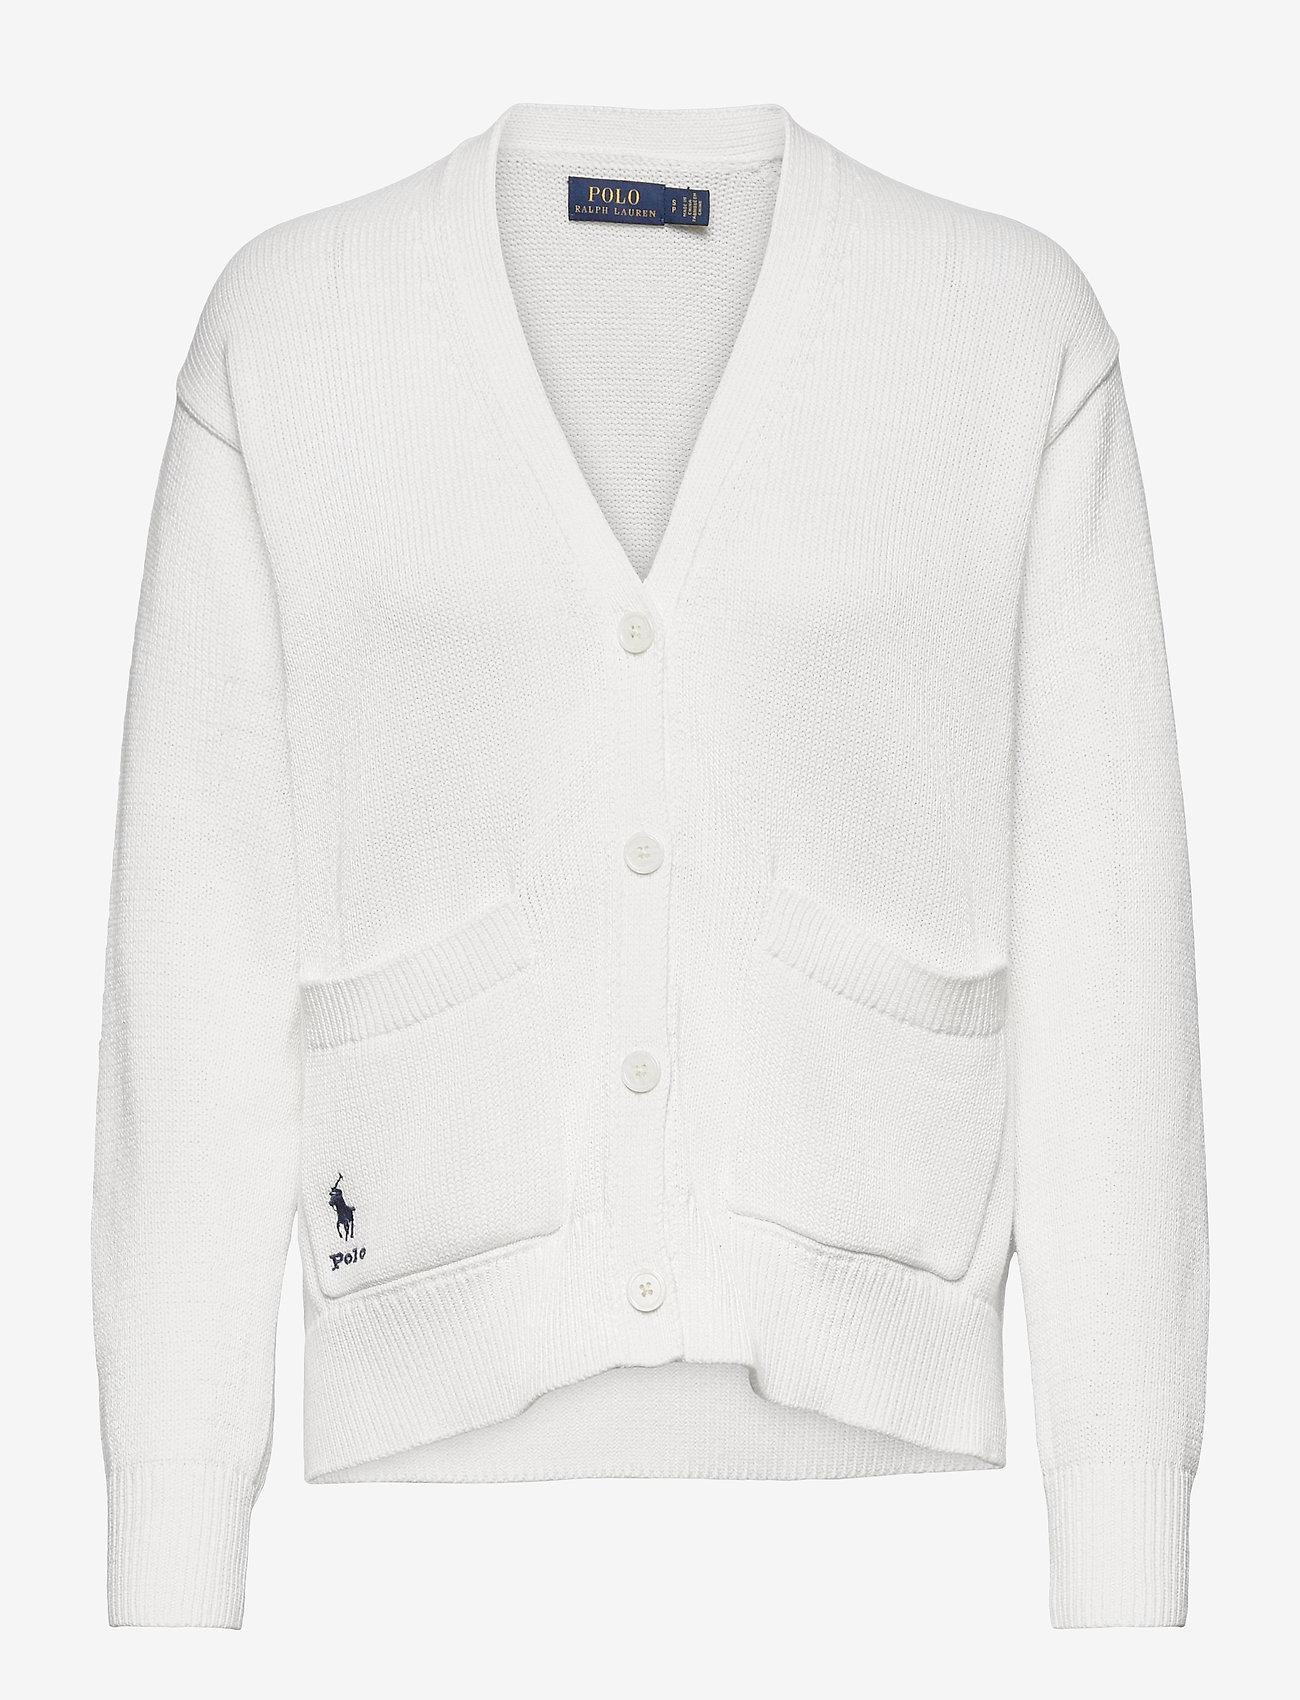 Polo Ralph Lauren - COTTON JERSEY-LSL-SWT - cardigans - white - 1